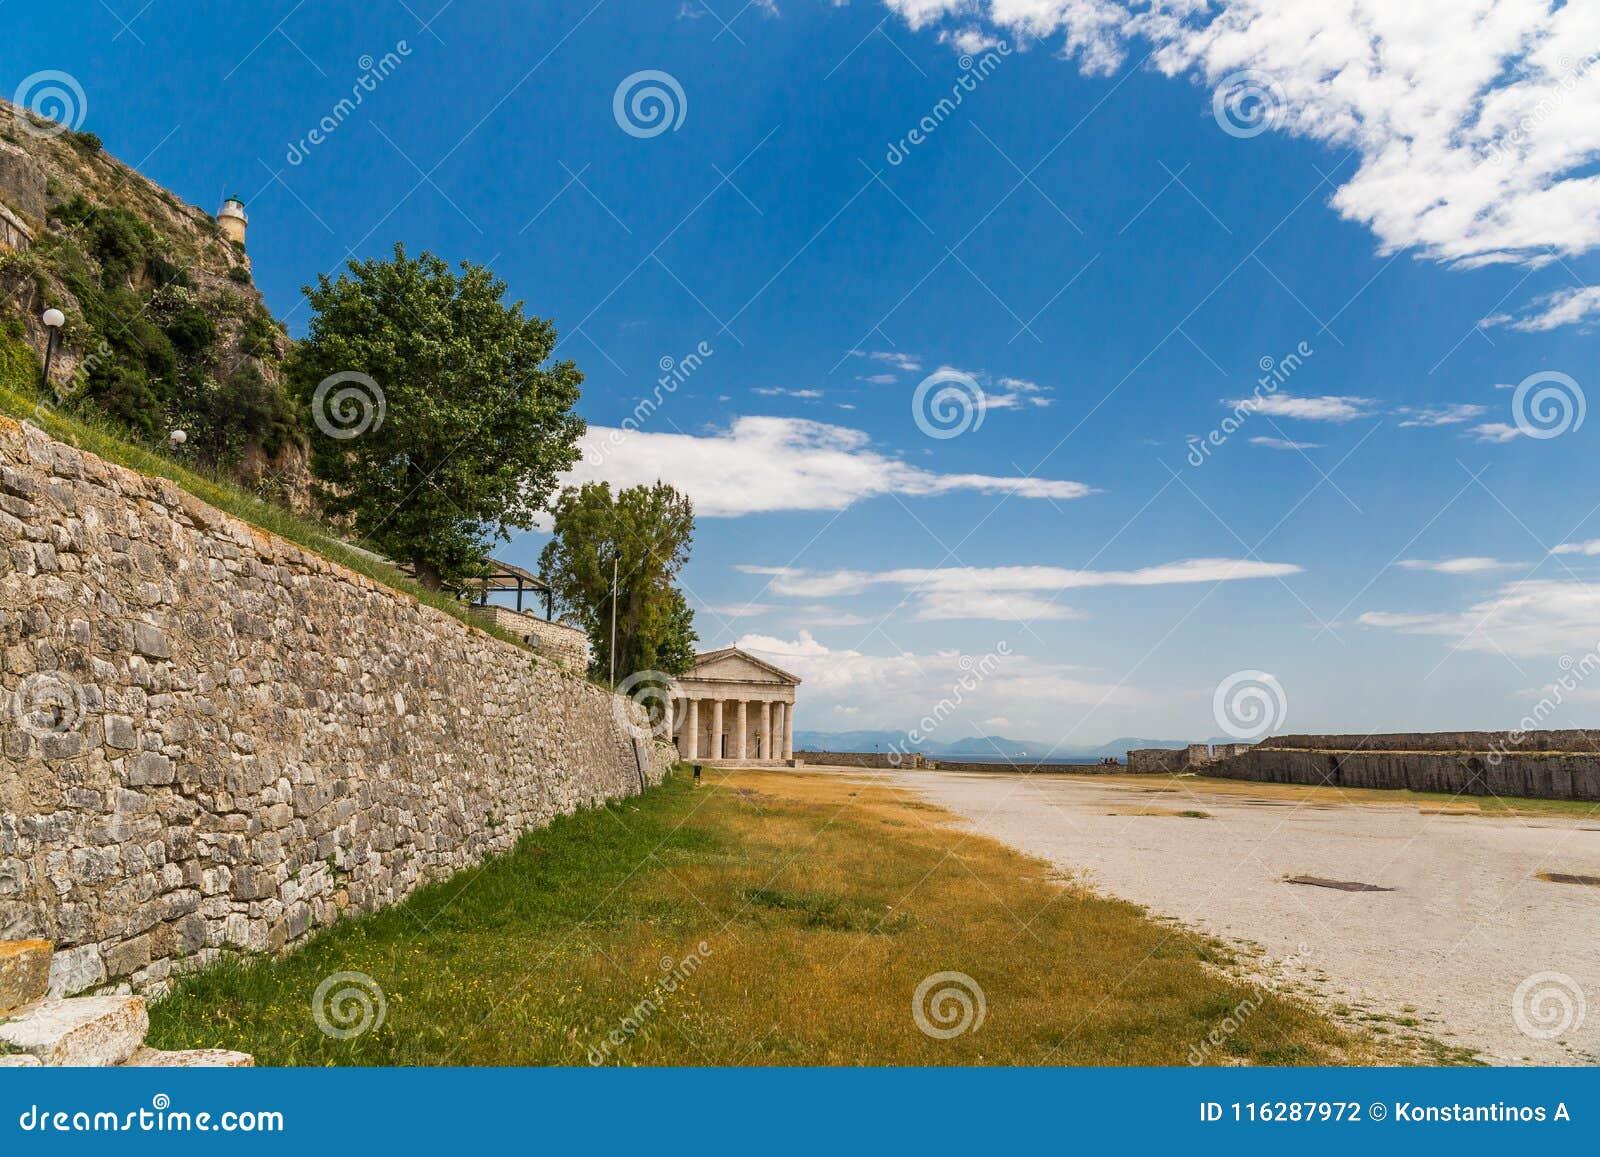 Corfu island saint george in the castle greece